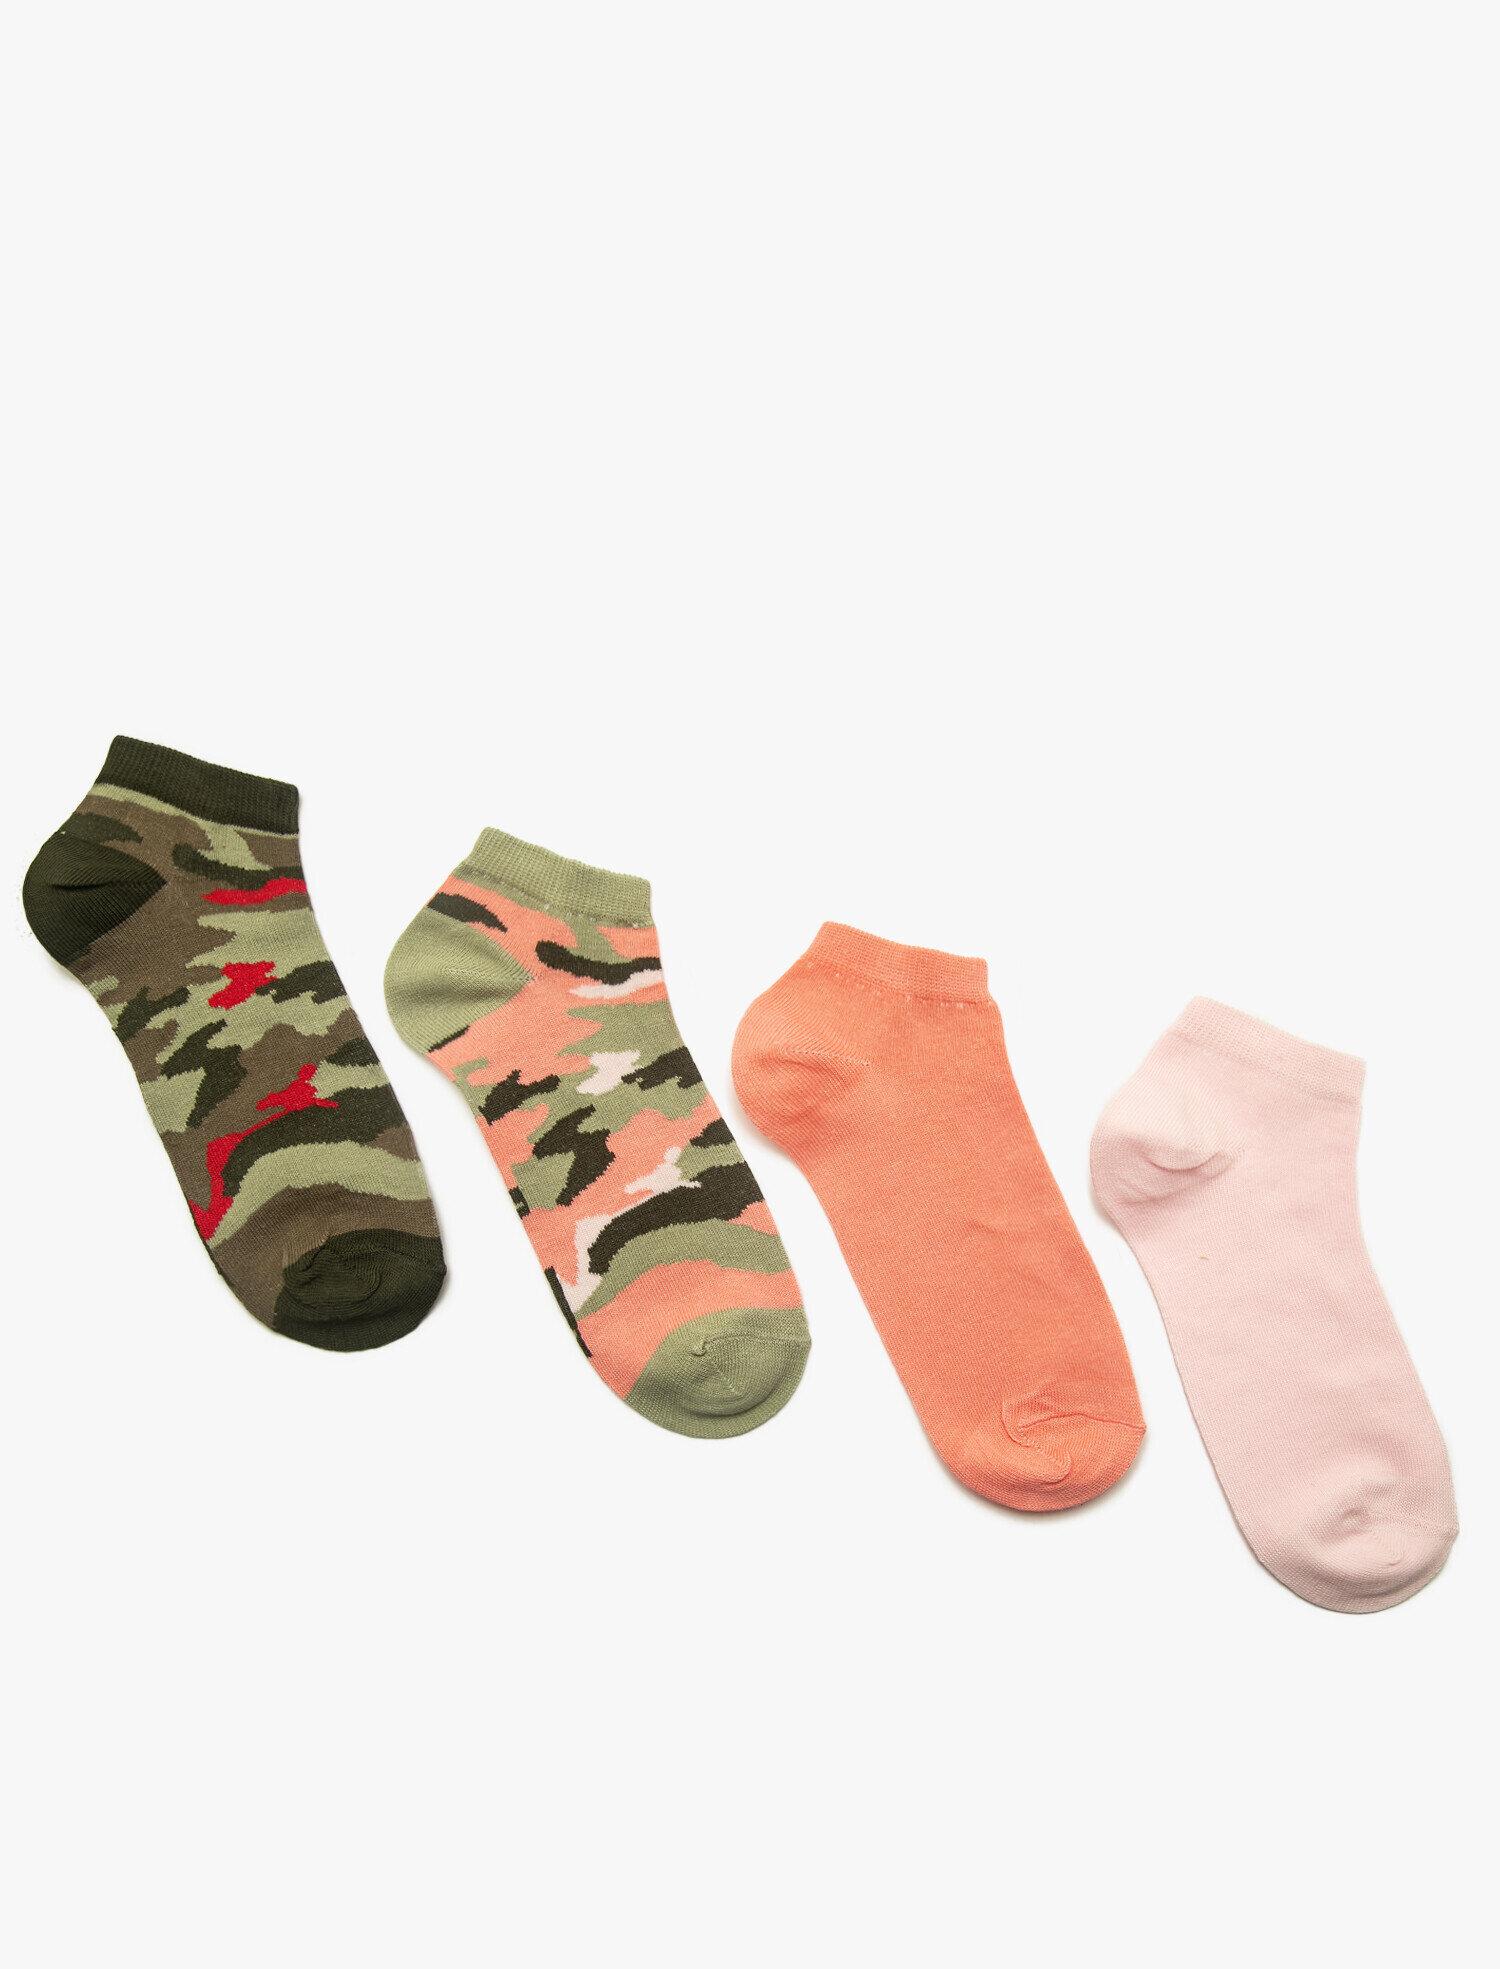 4 Pack Woman Socks